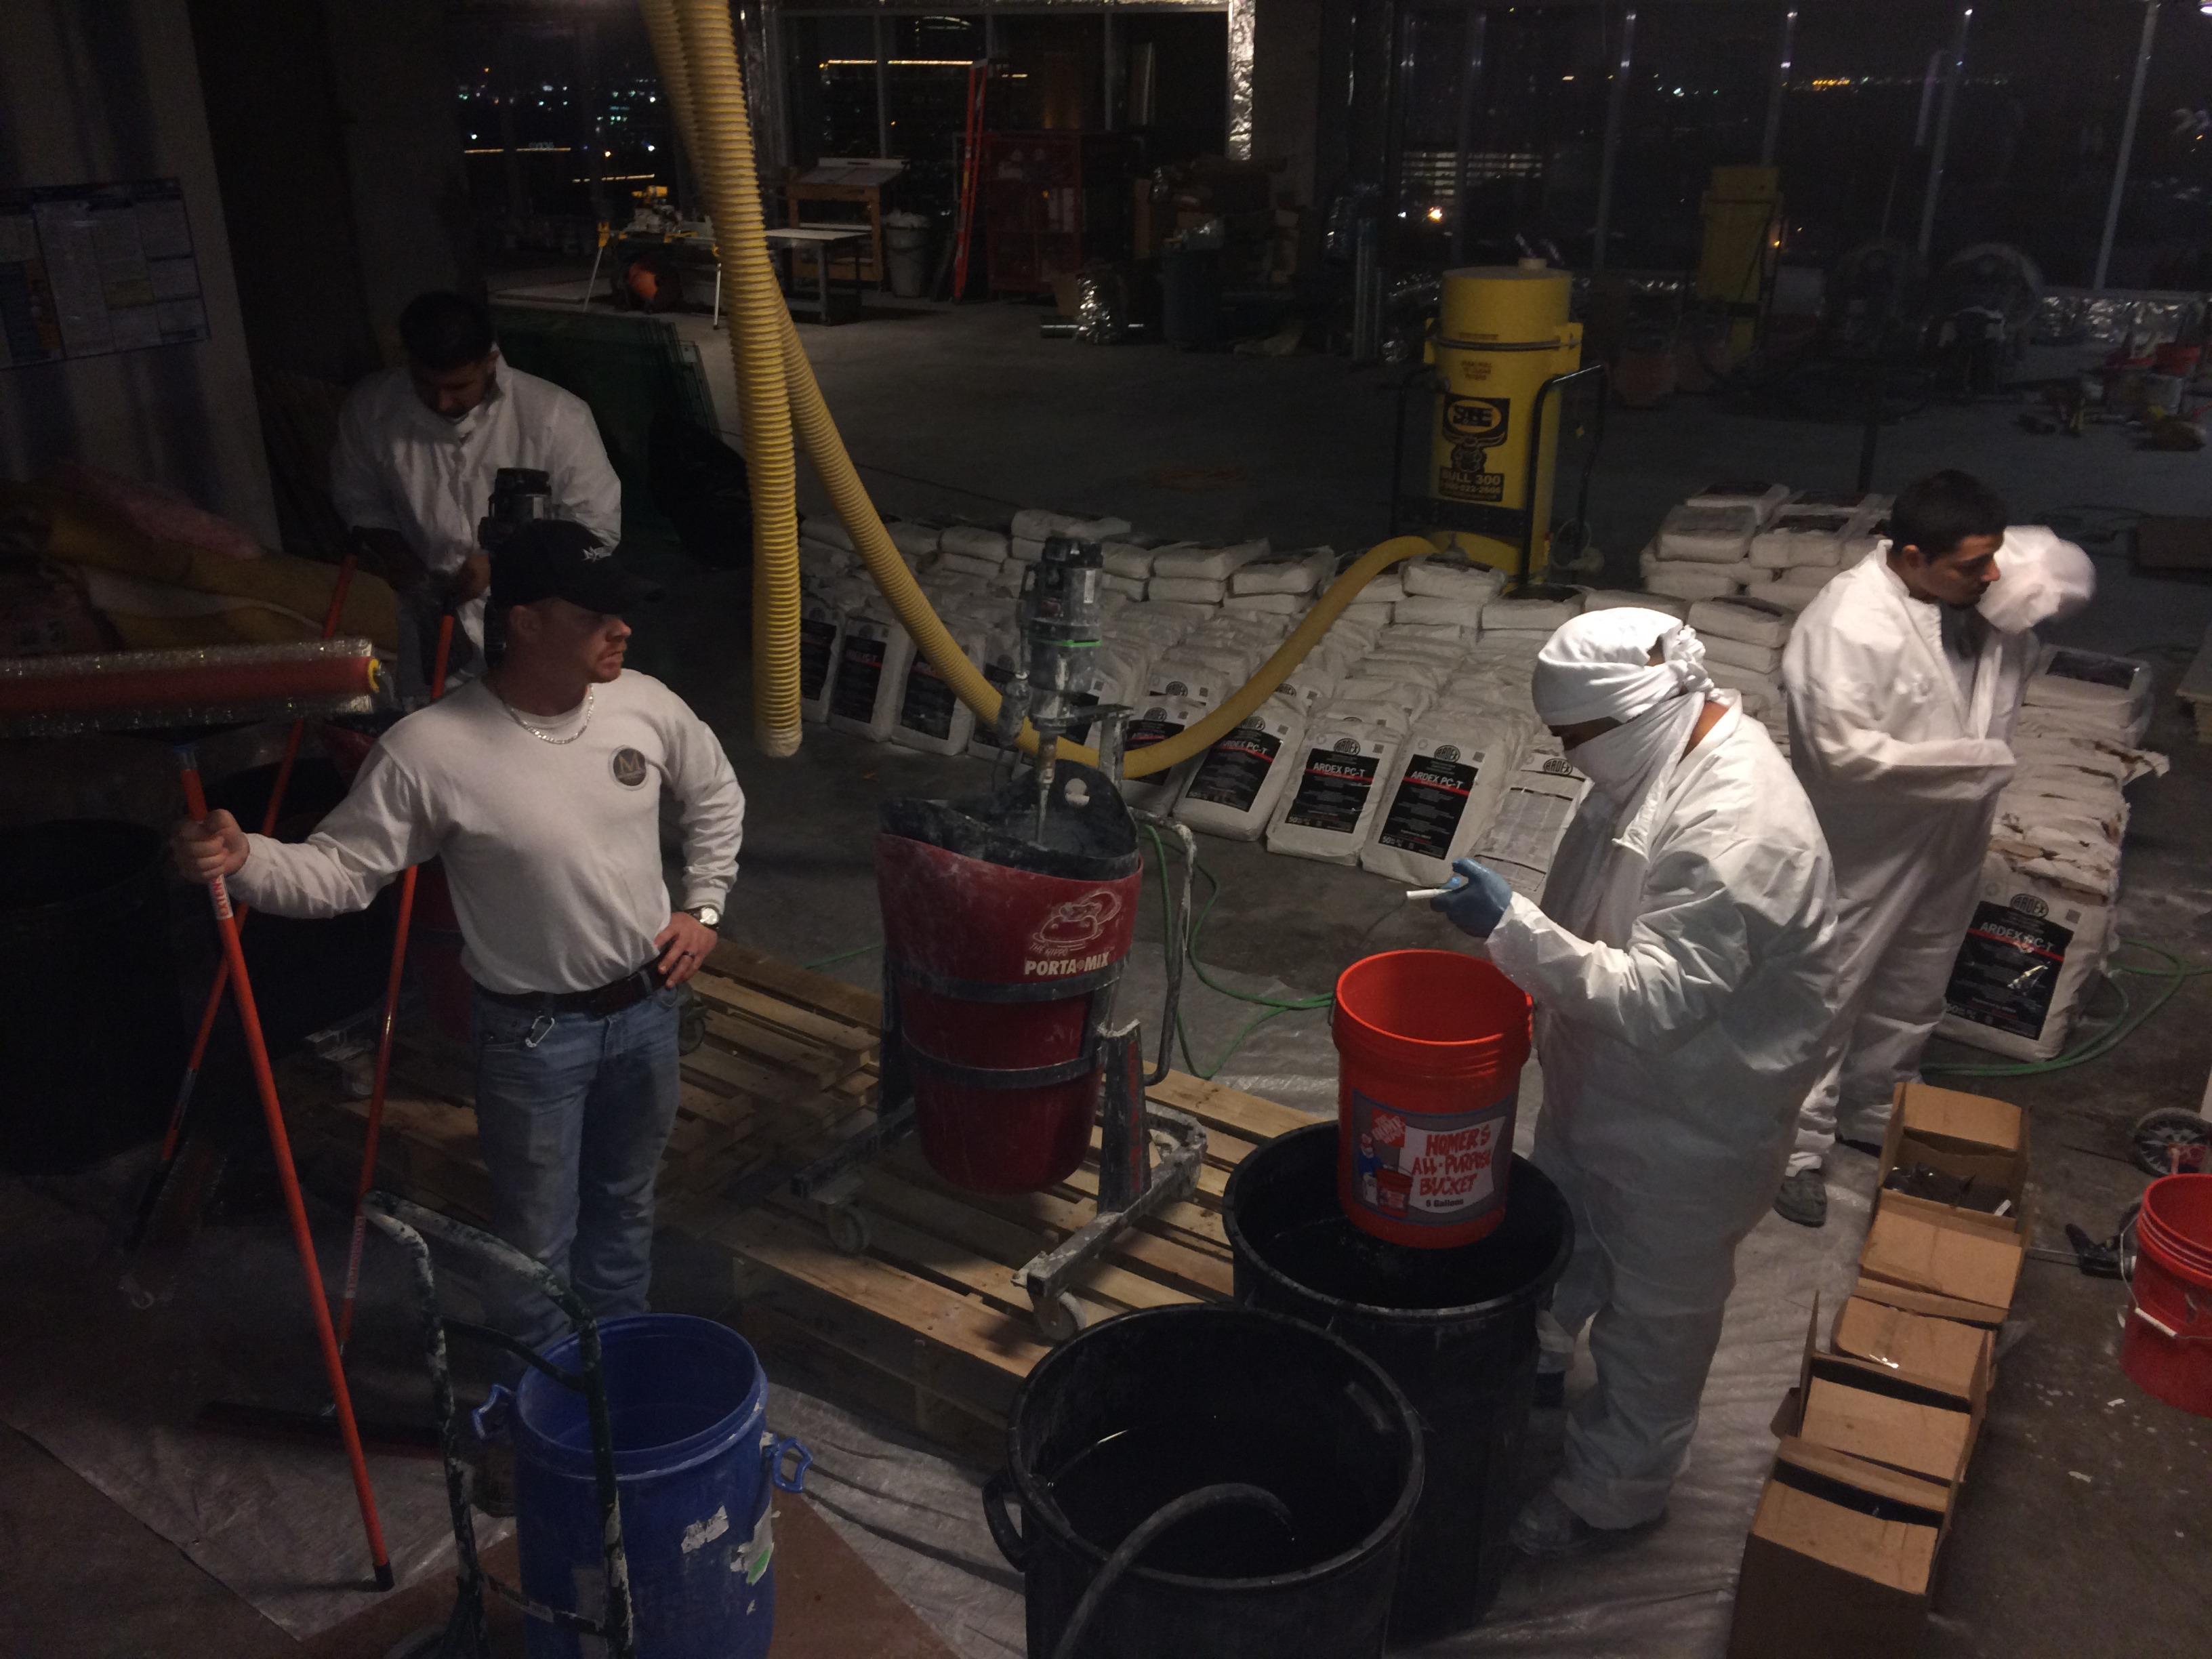 Preparing the RapidSet TRU